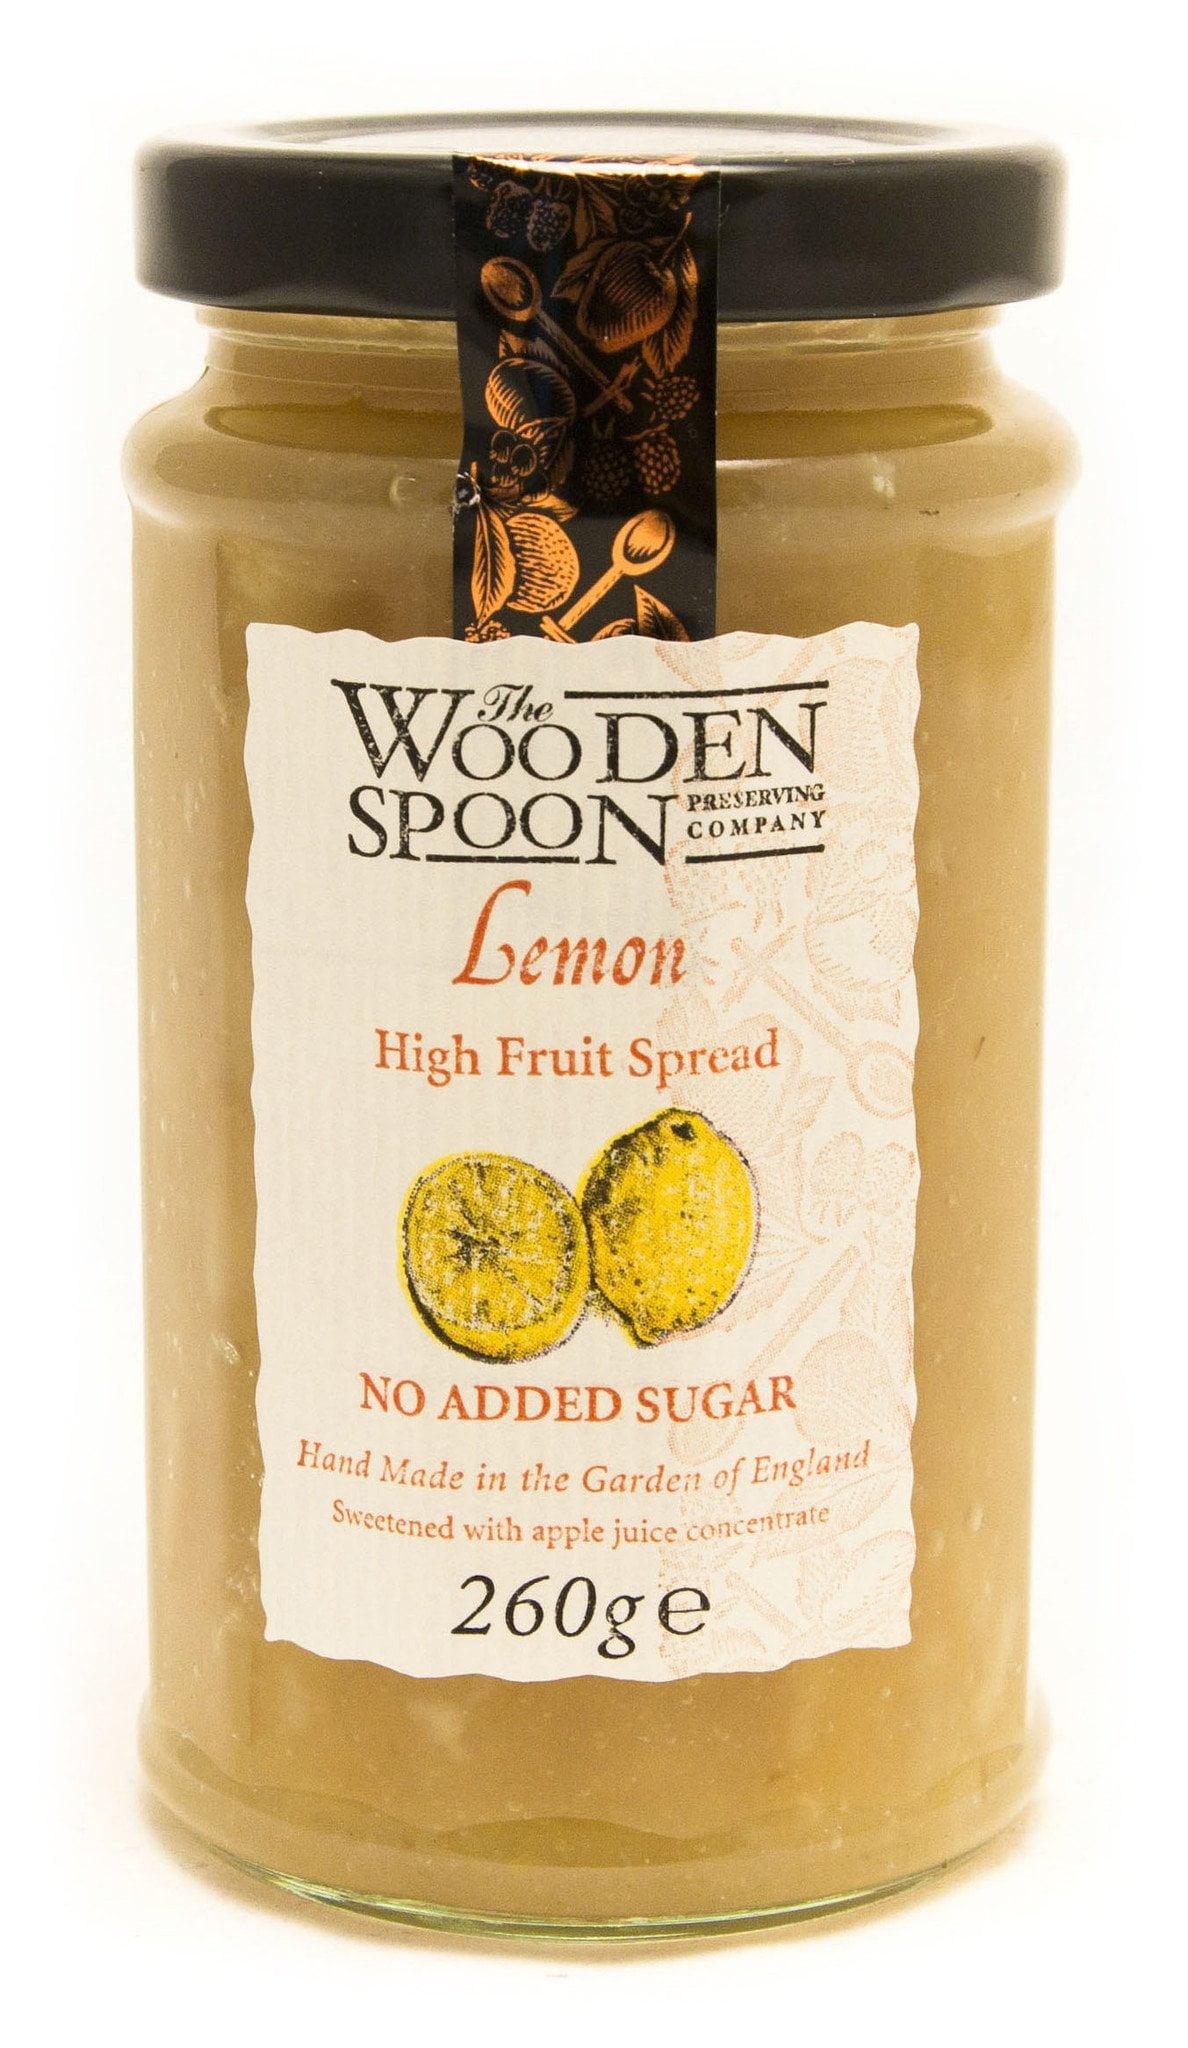 Lemon - High Fruit Spread